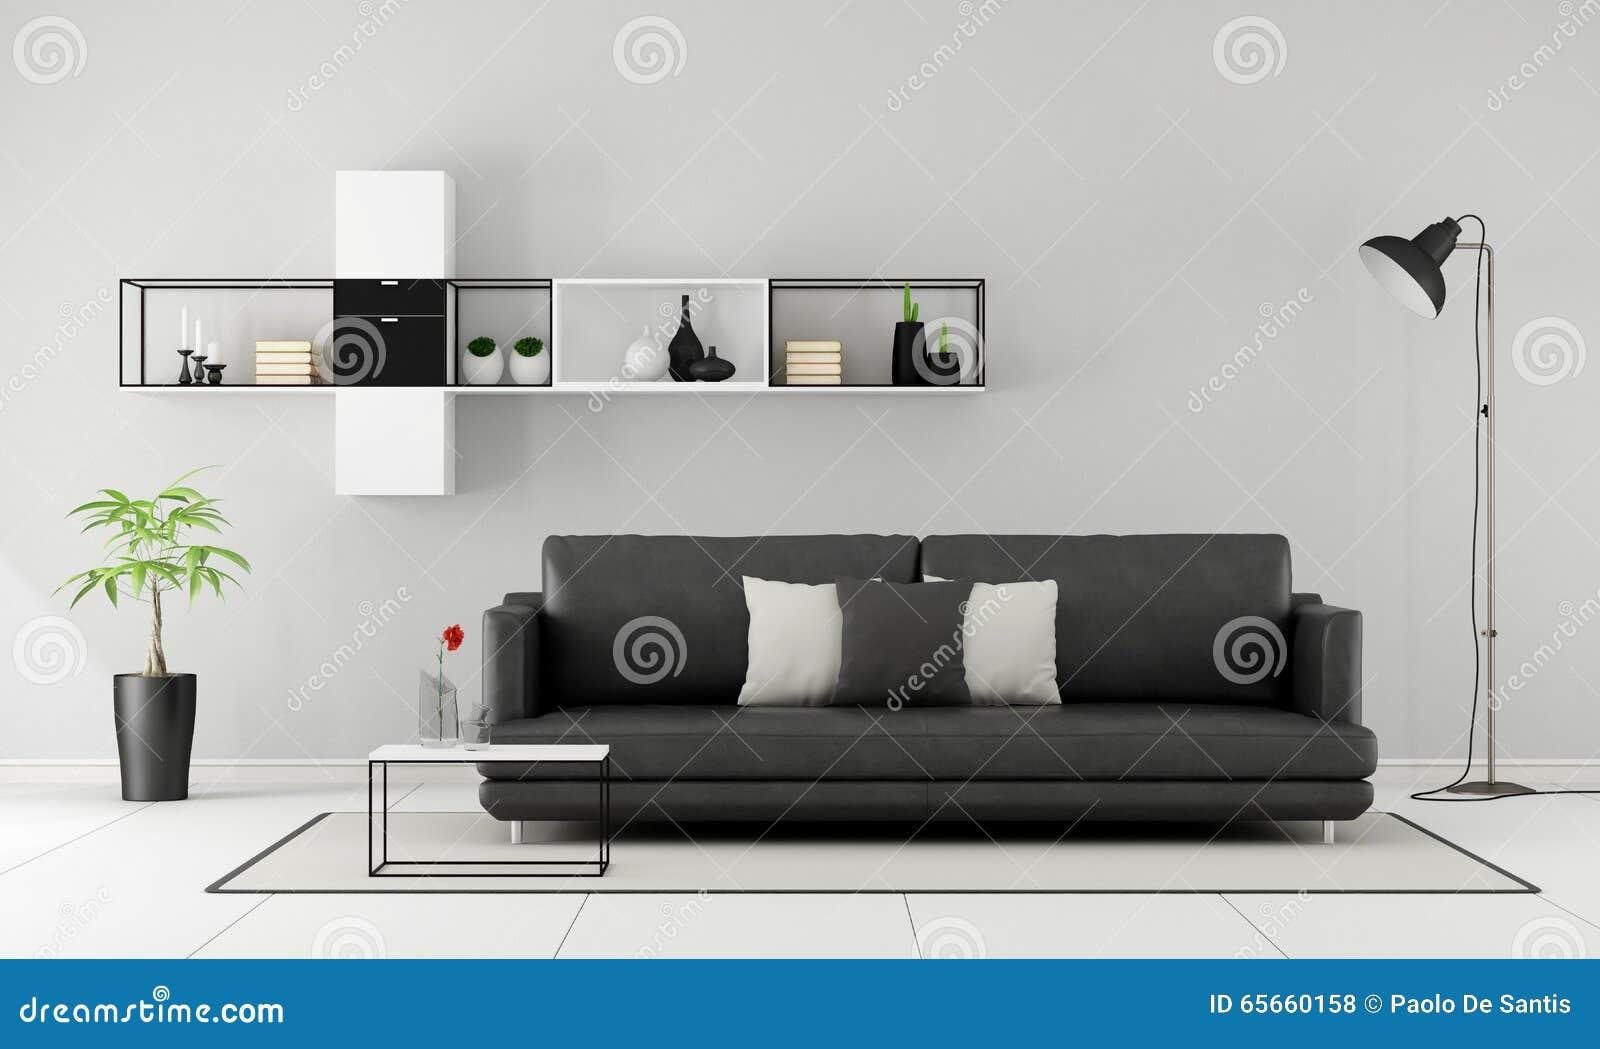 saln minimalista blanco y negro stock de ilustracin